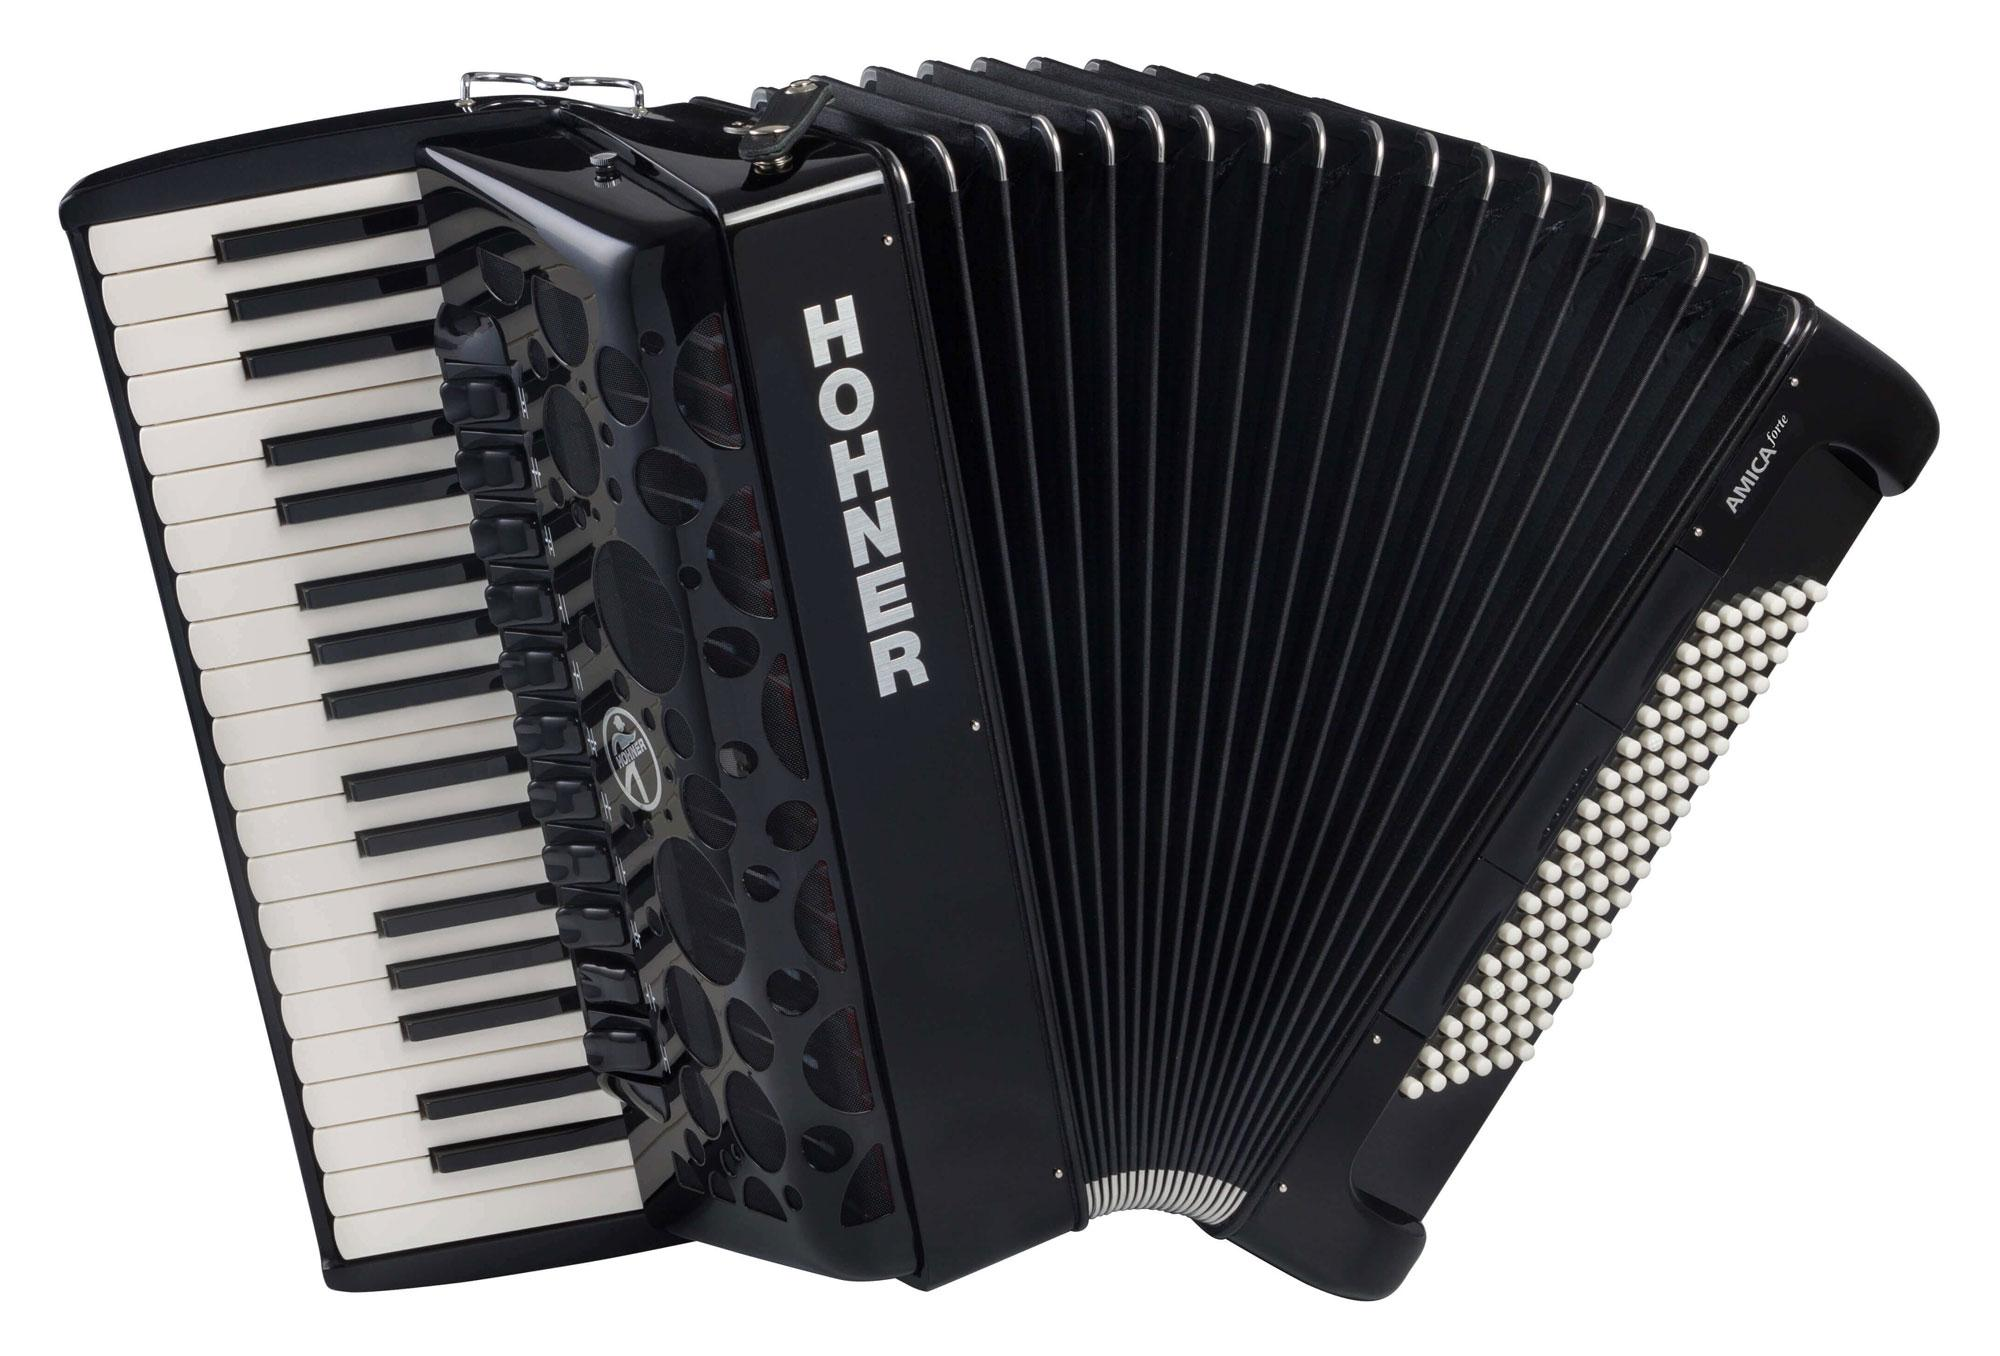 Hohner Amica IV 96 Forte schwarz